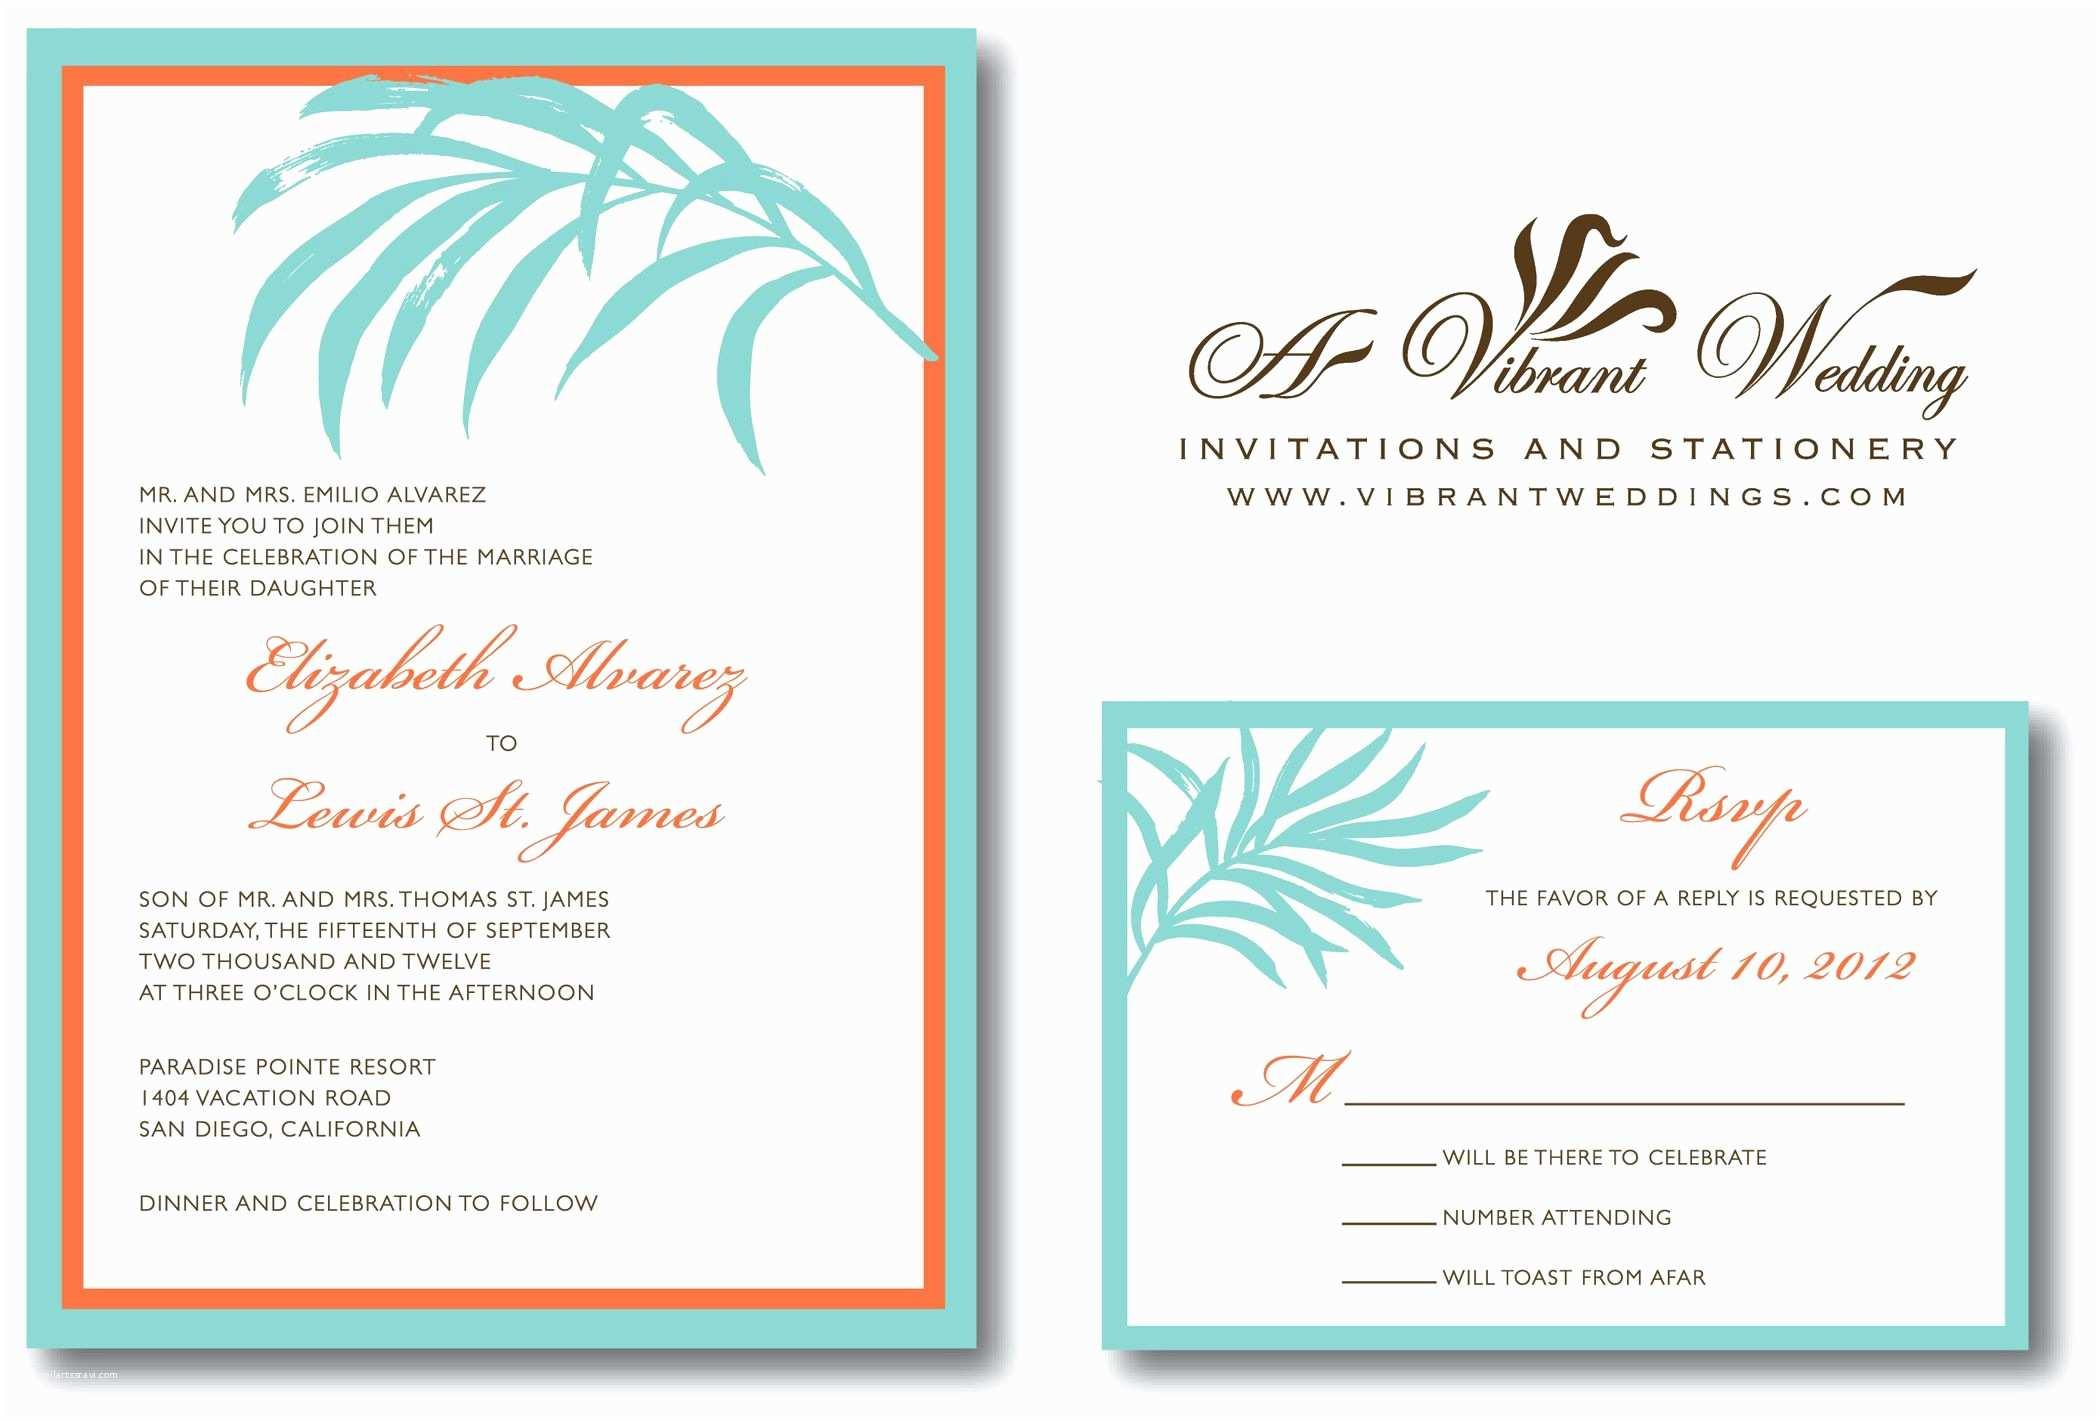 Wedding Invitation attire Wording Beach Wedding Invitations Wording Beach Wedding